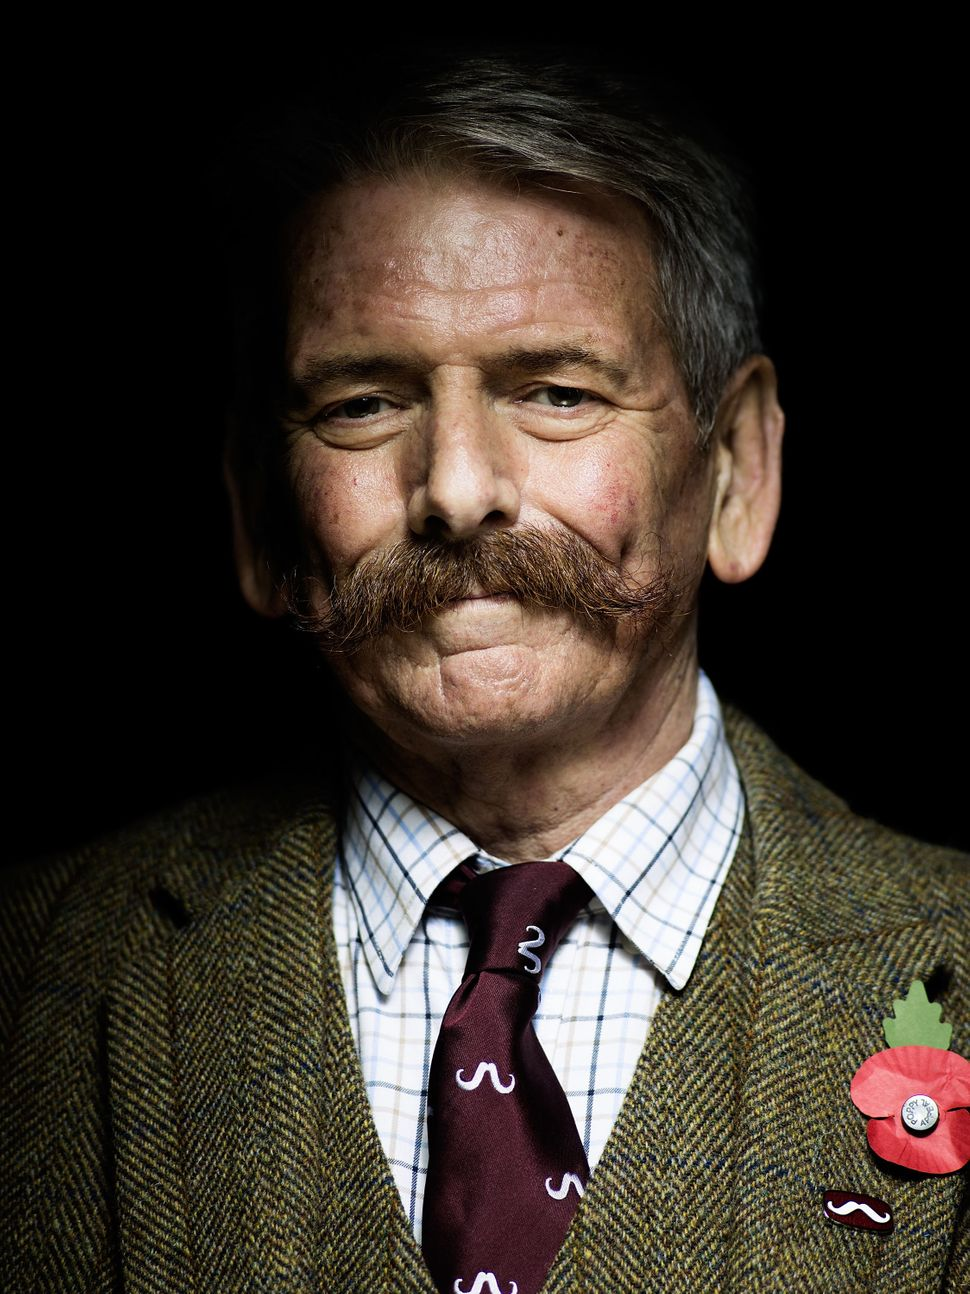 Handlebar Club member John Satchell, sporting a classic handlebar moustache.